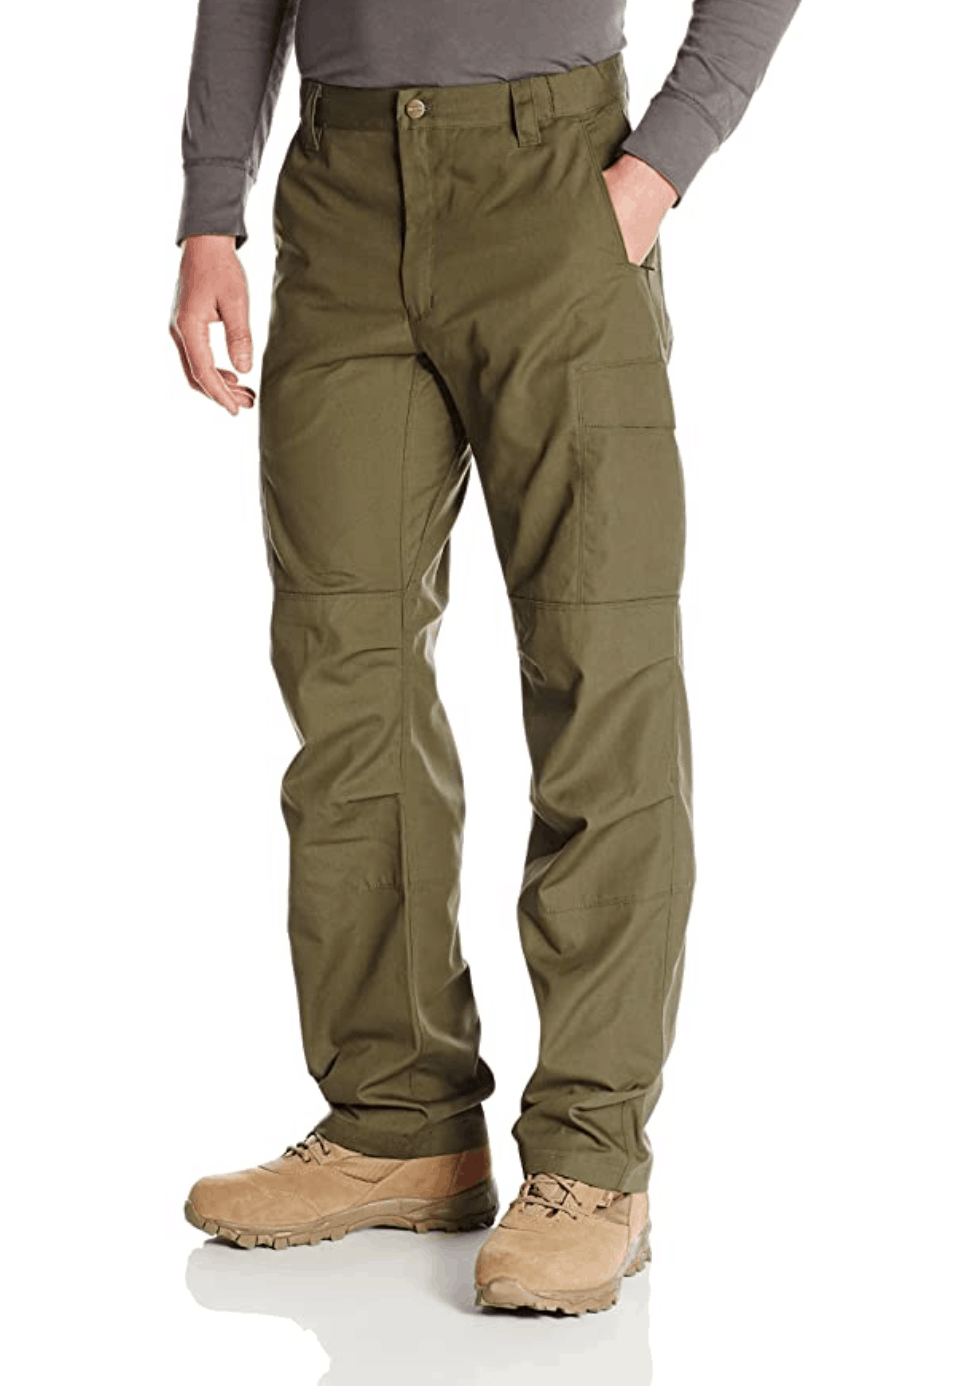 Vrtx Phantom OPS Tactical Pants